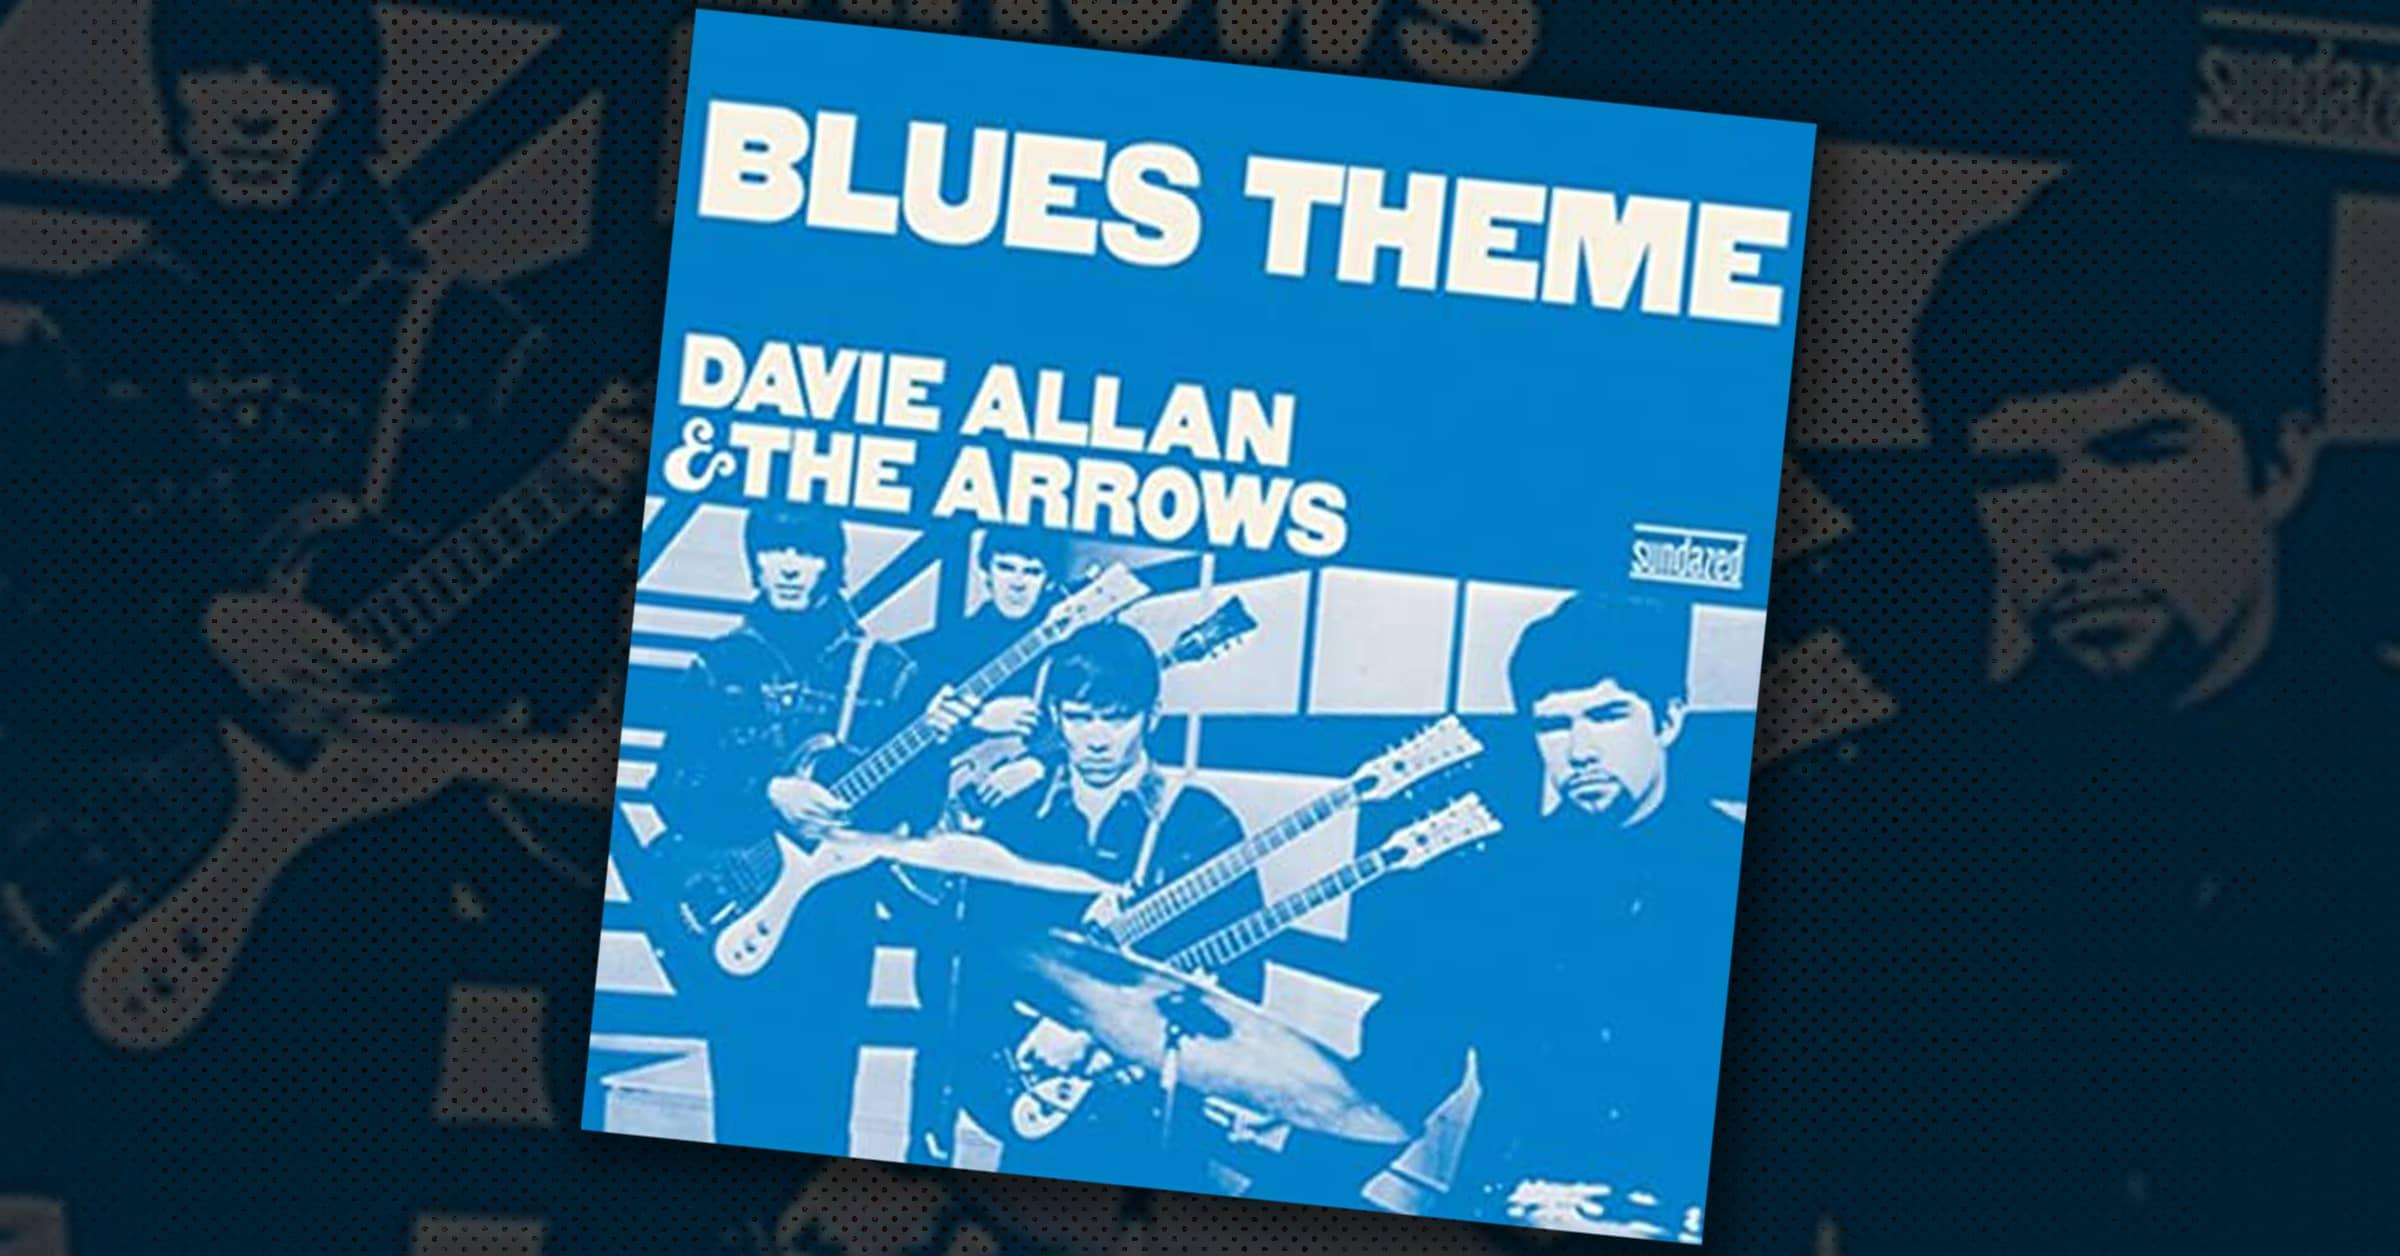 Davie Allan and the Arrows: Blues Theme Album Cover